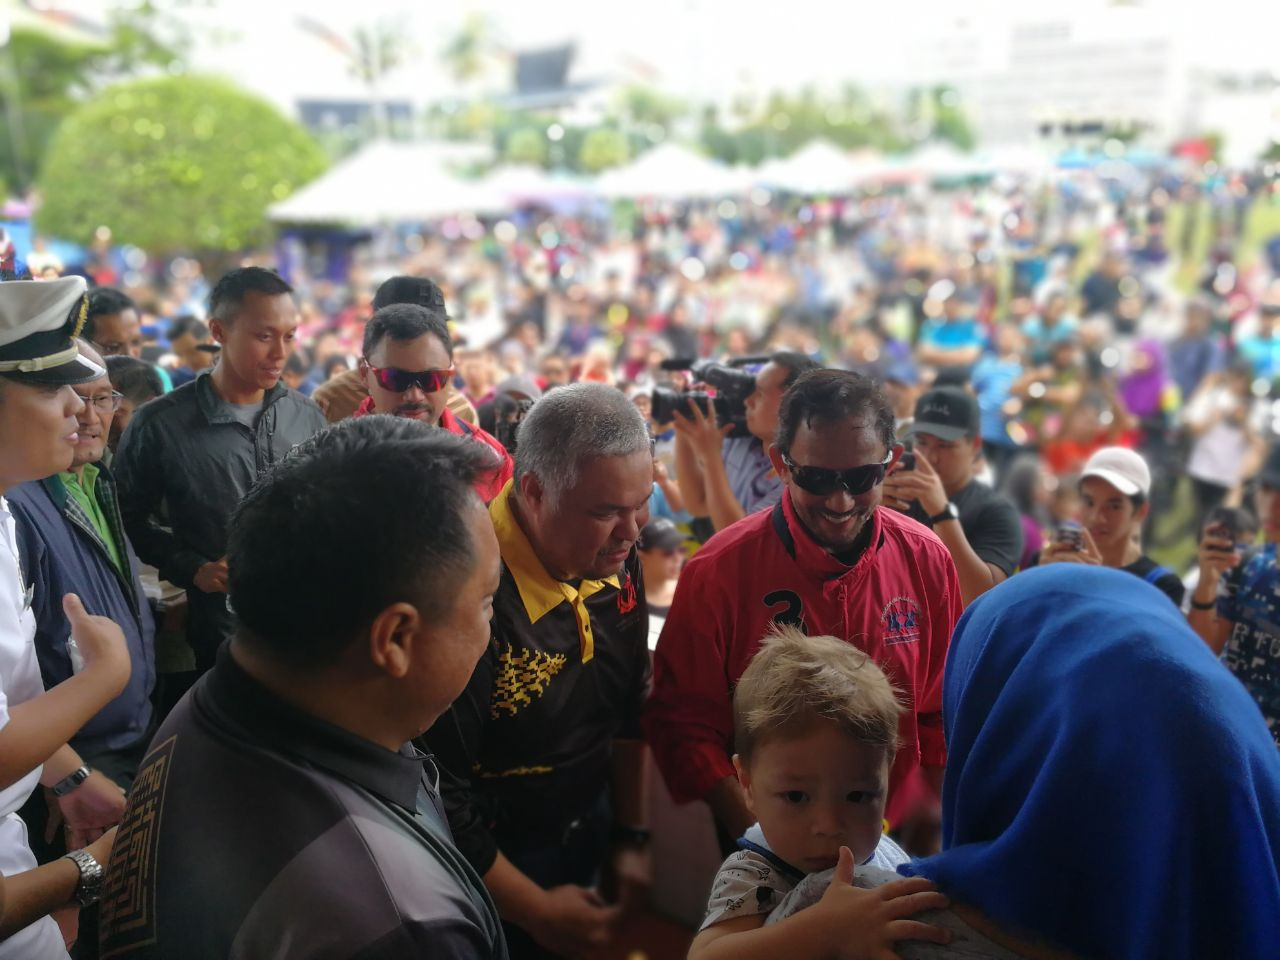 His Majesty meeting the people during the Bandarku Ceria event on Sunday Morning. Photo: Ubaidillah Masli/The Scoop